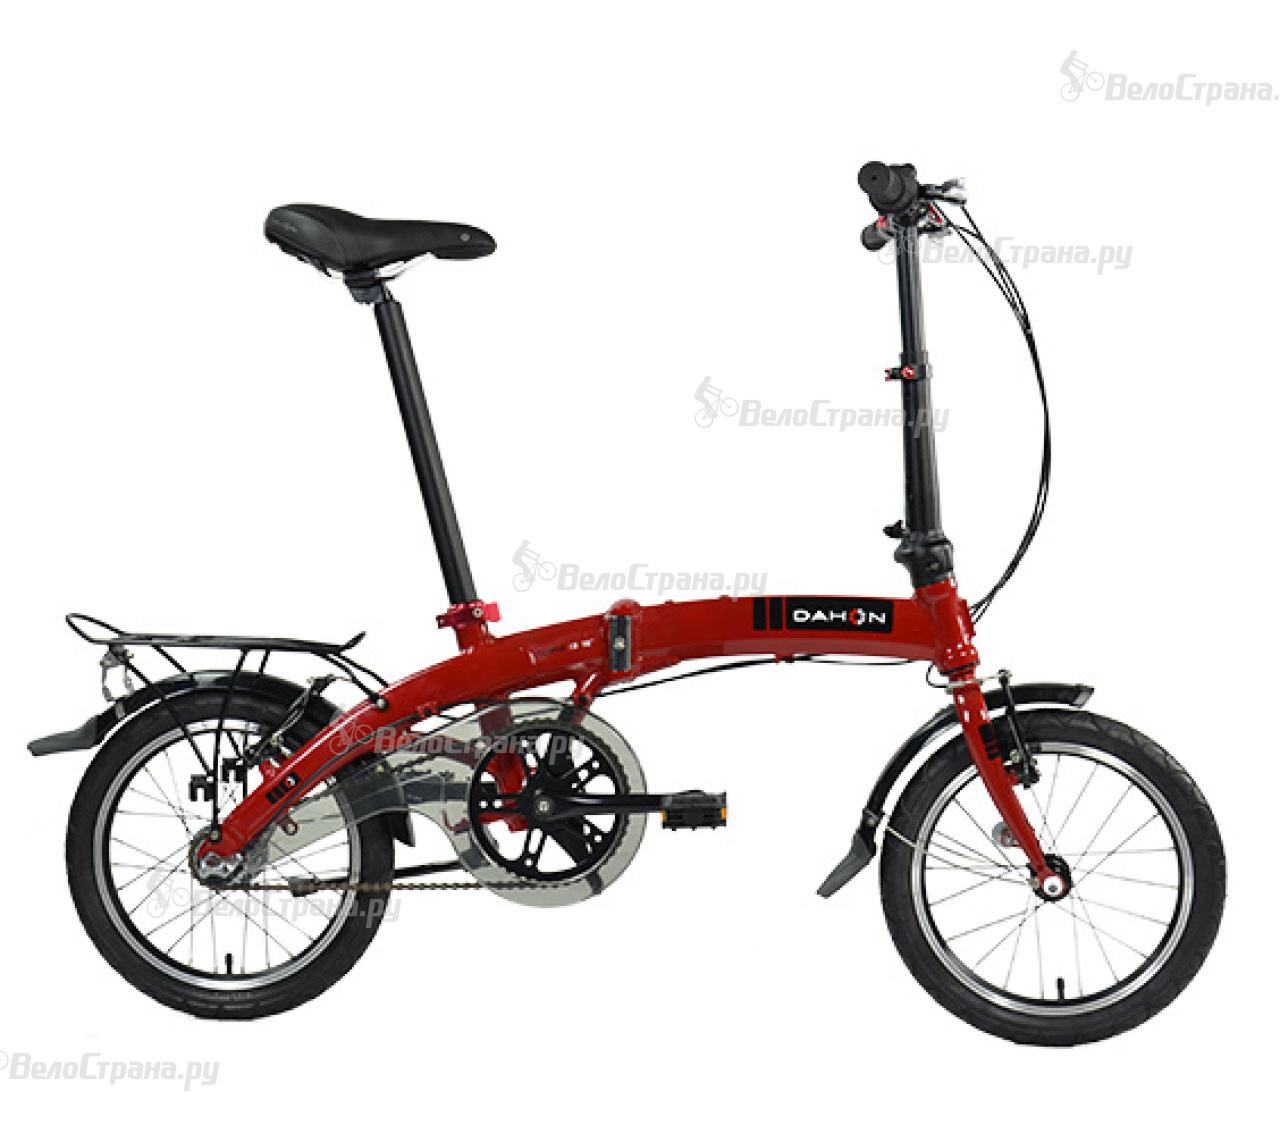 Велосипед Dahon Curve i3 16 (2017)